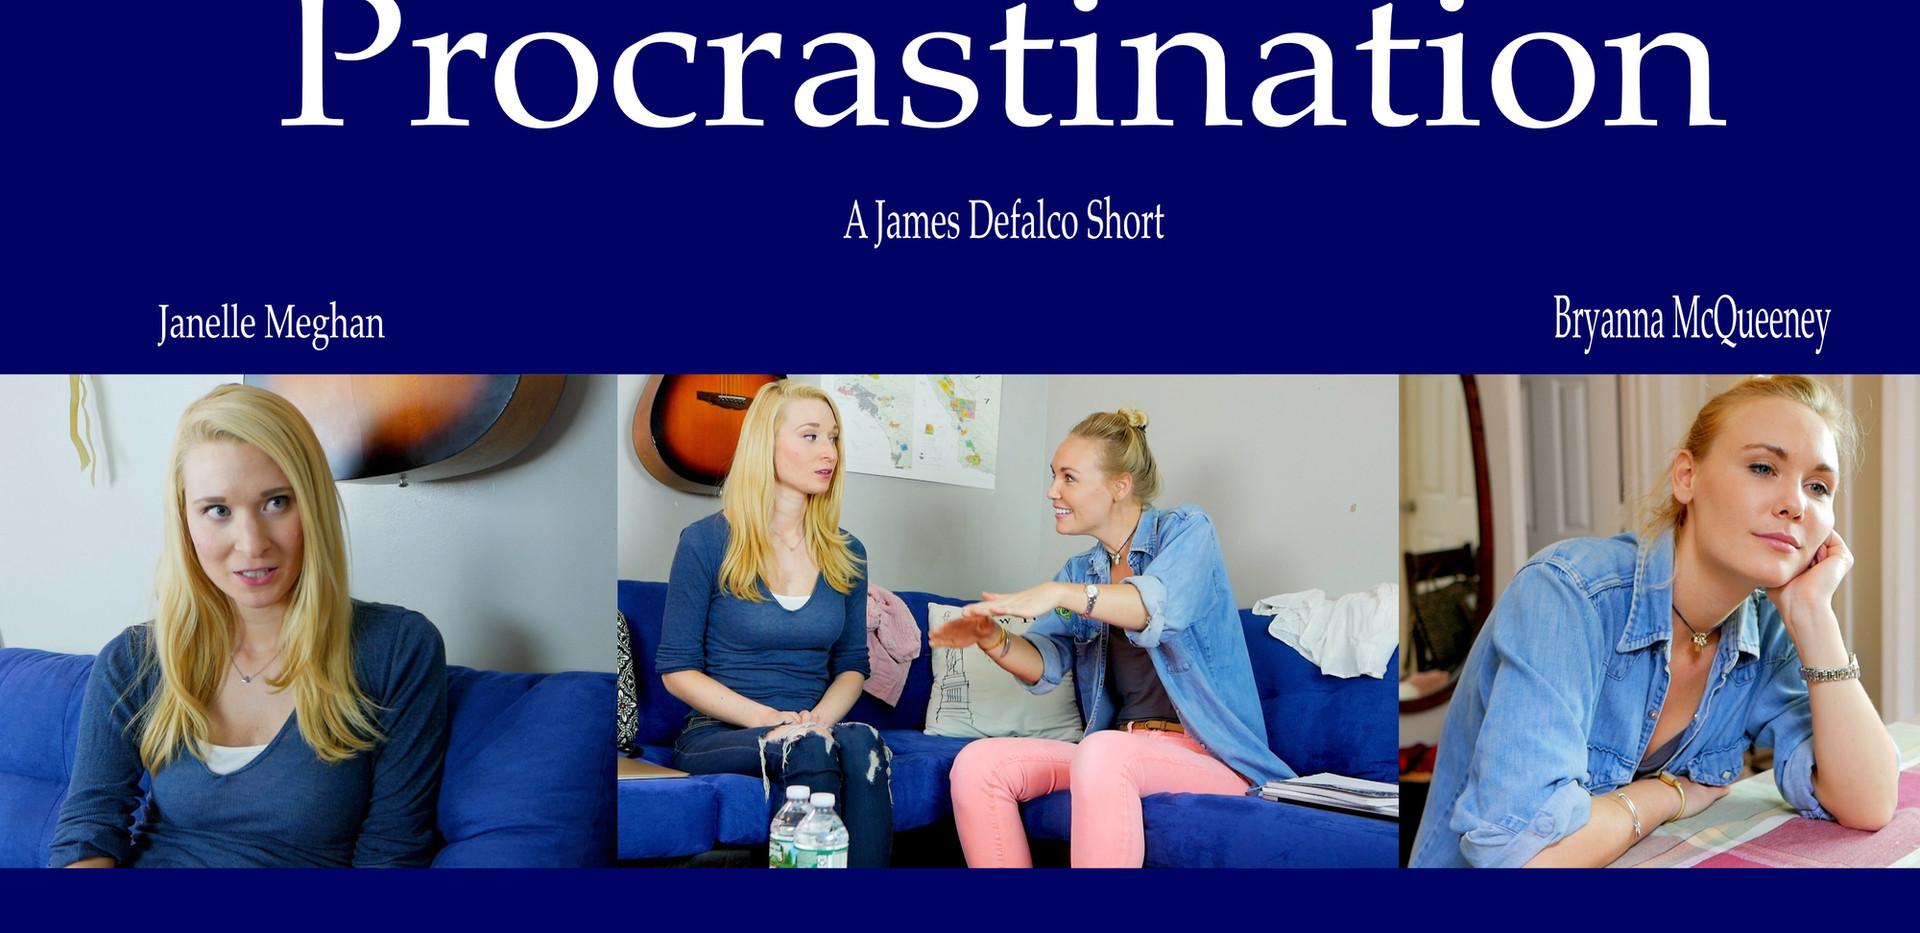 Procrastination Poster.jpg